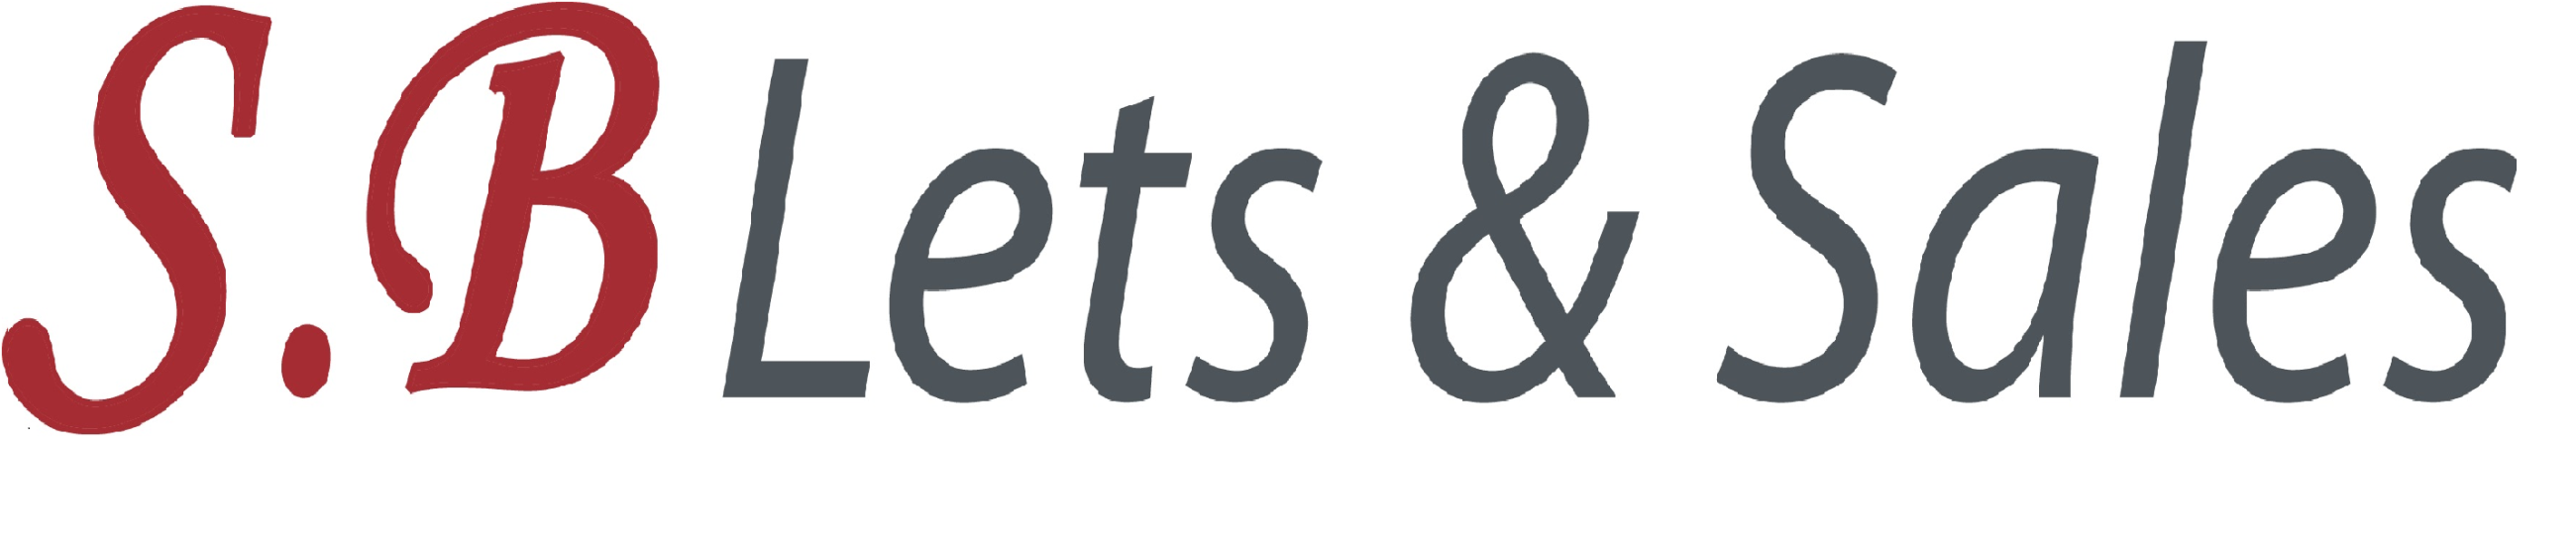 SB Lets & Sales